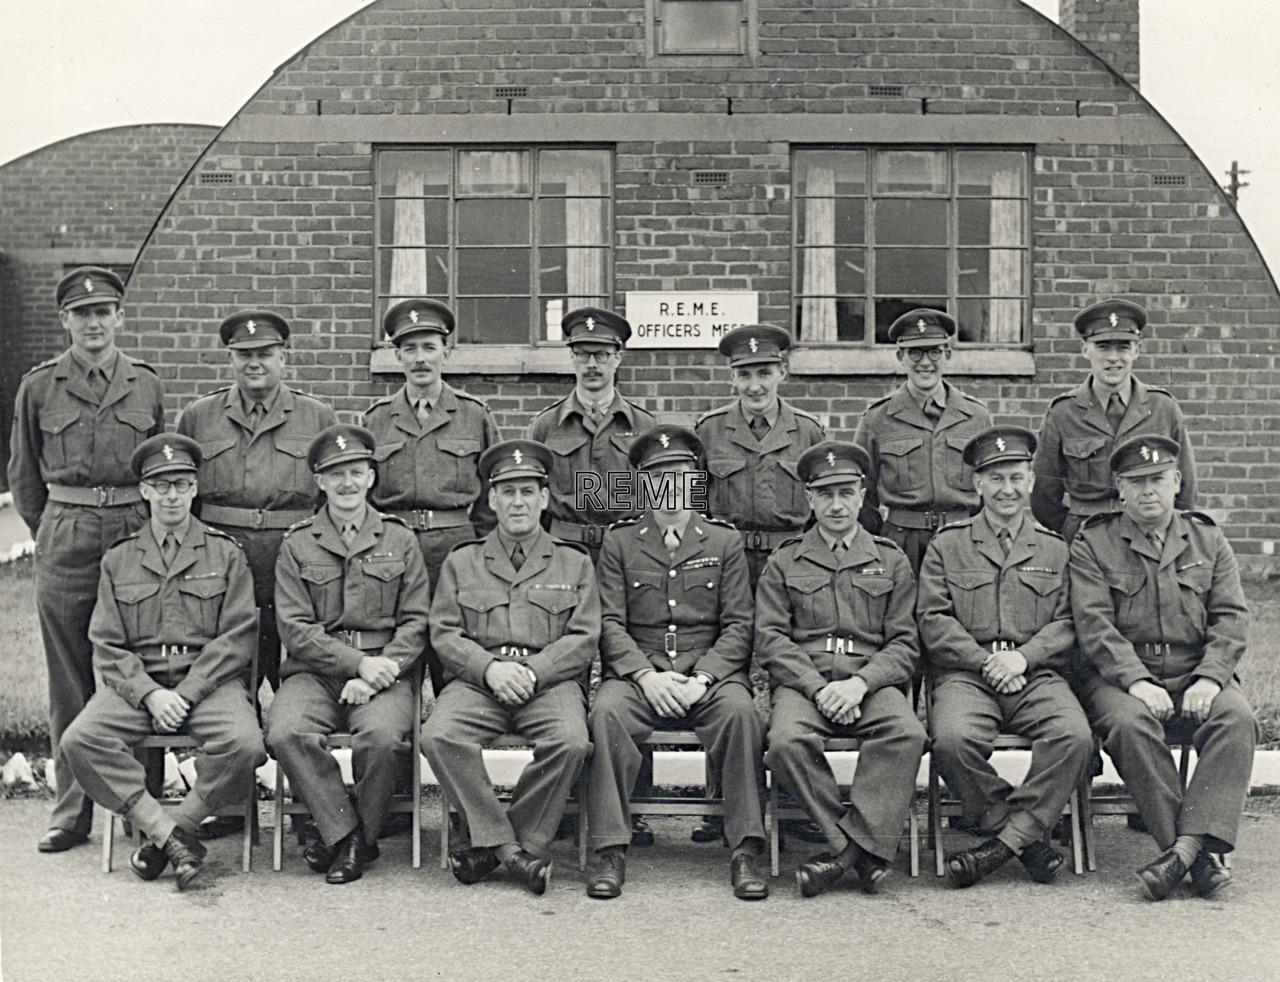 No 2 Royal Naval Air Service (RNAS), Camp Burscough